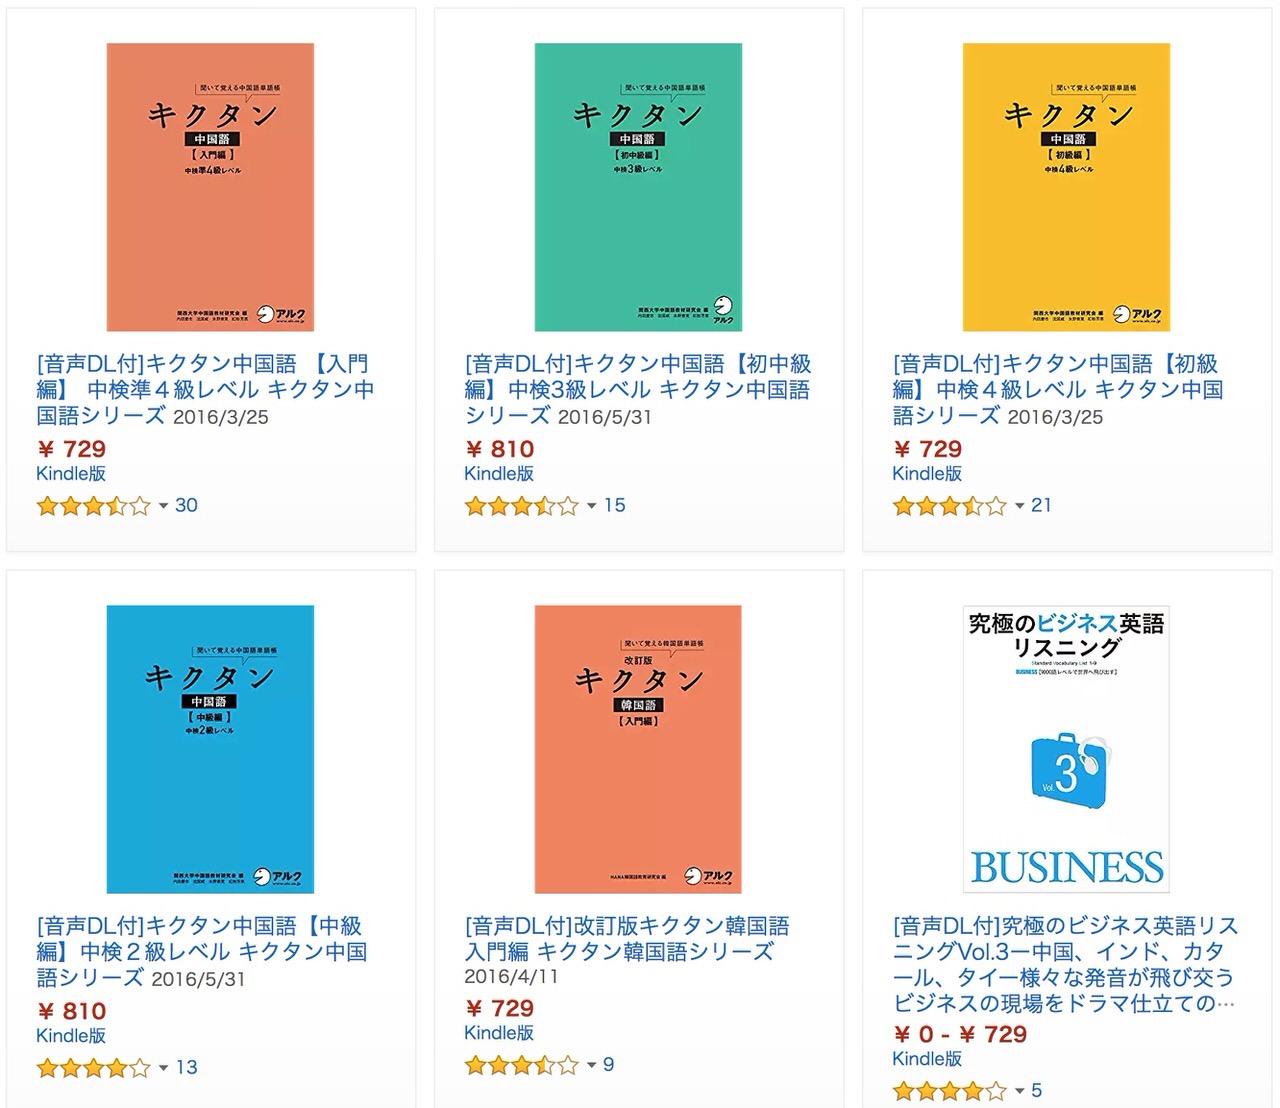 【Kindleセール】50%OFF!アルク「おもてなしと他言語セール」(7/26まで)